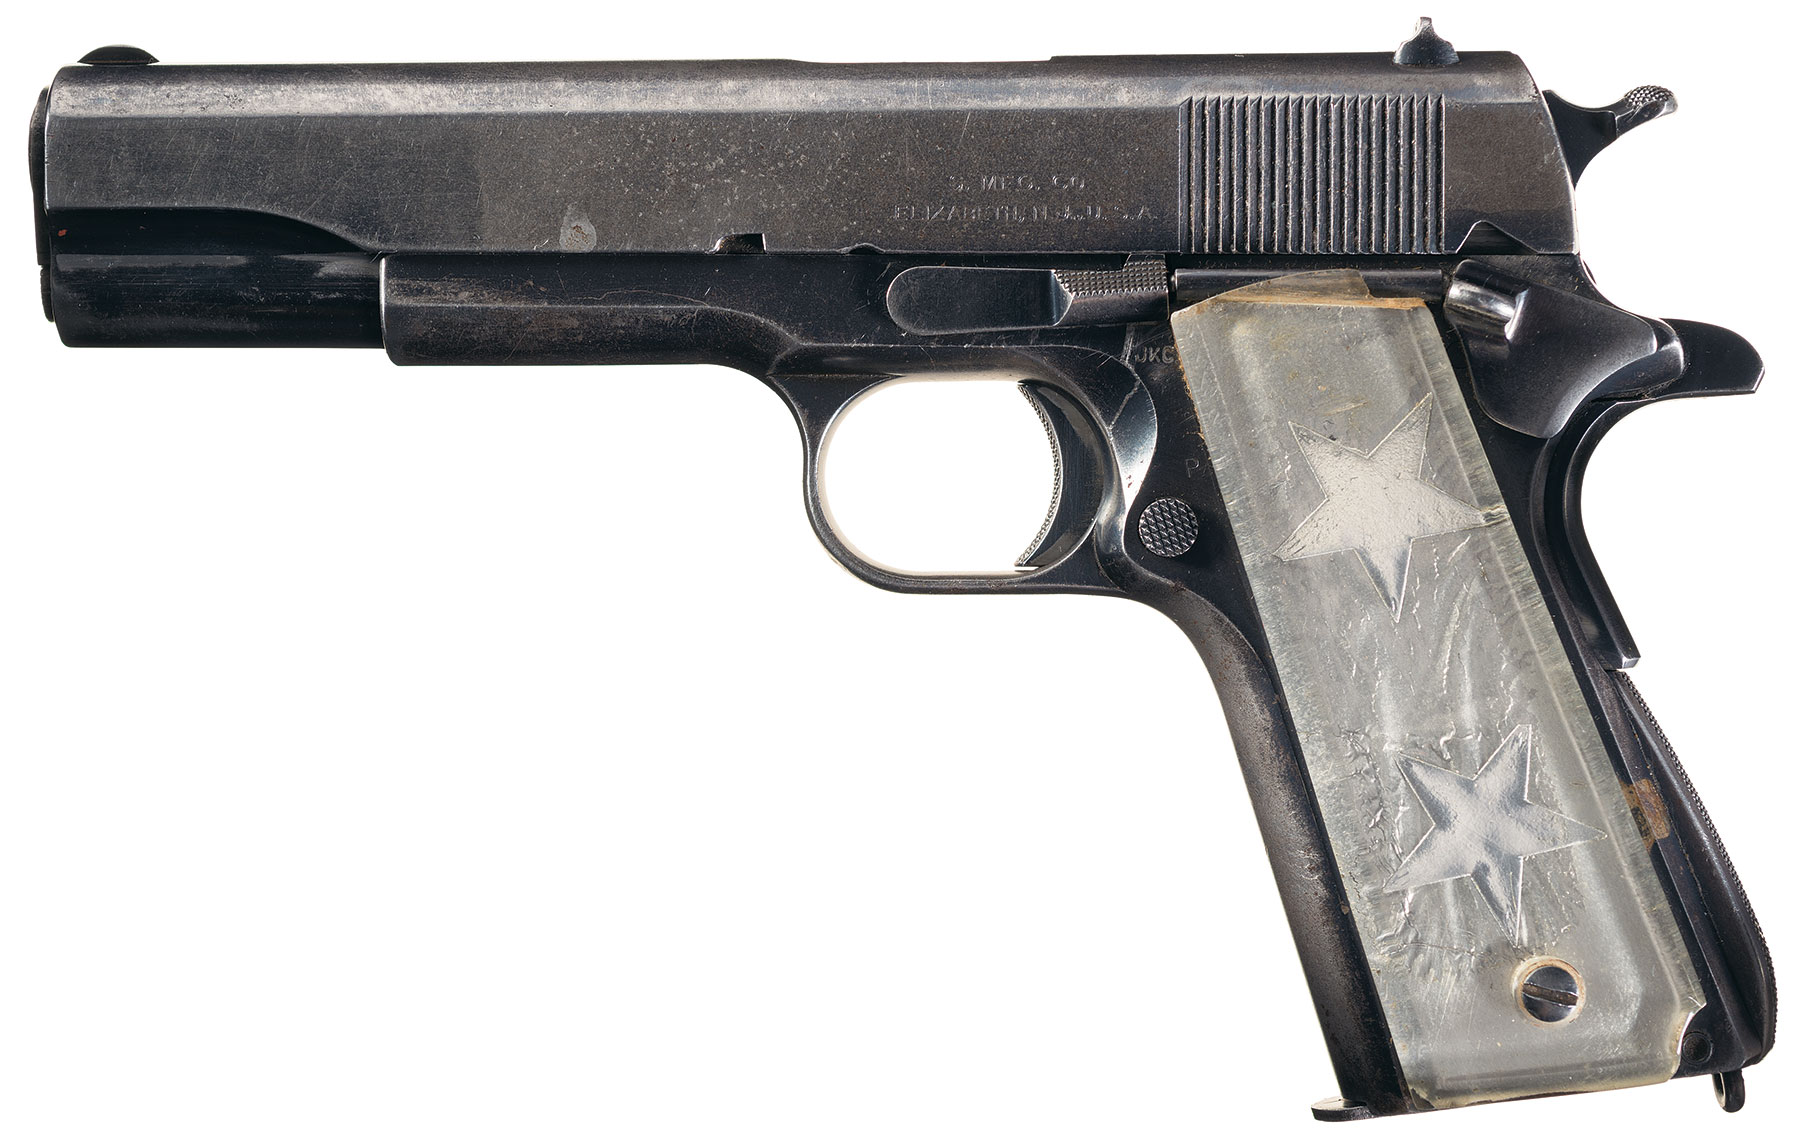 Singer - 1911A1